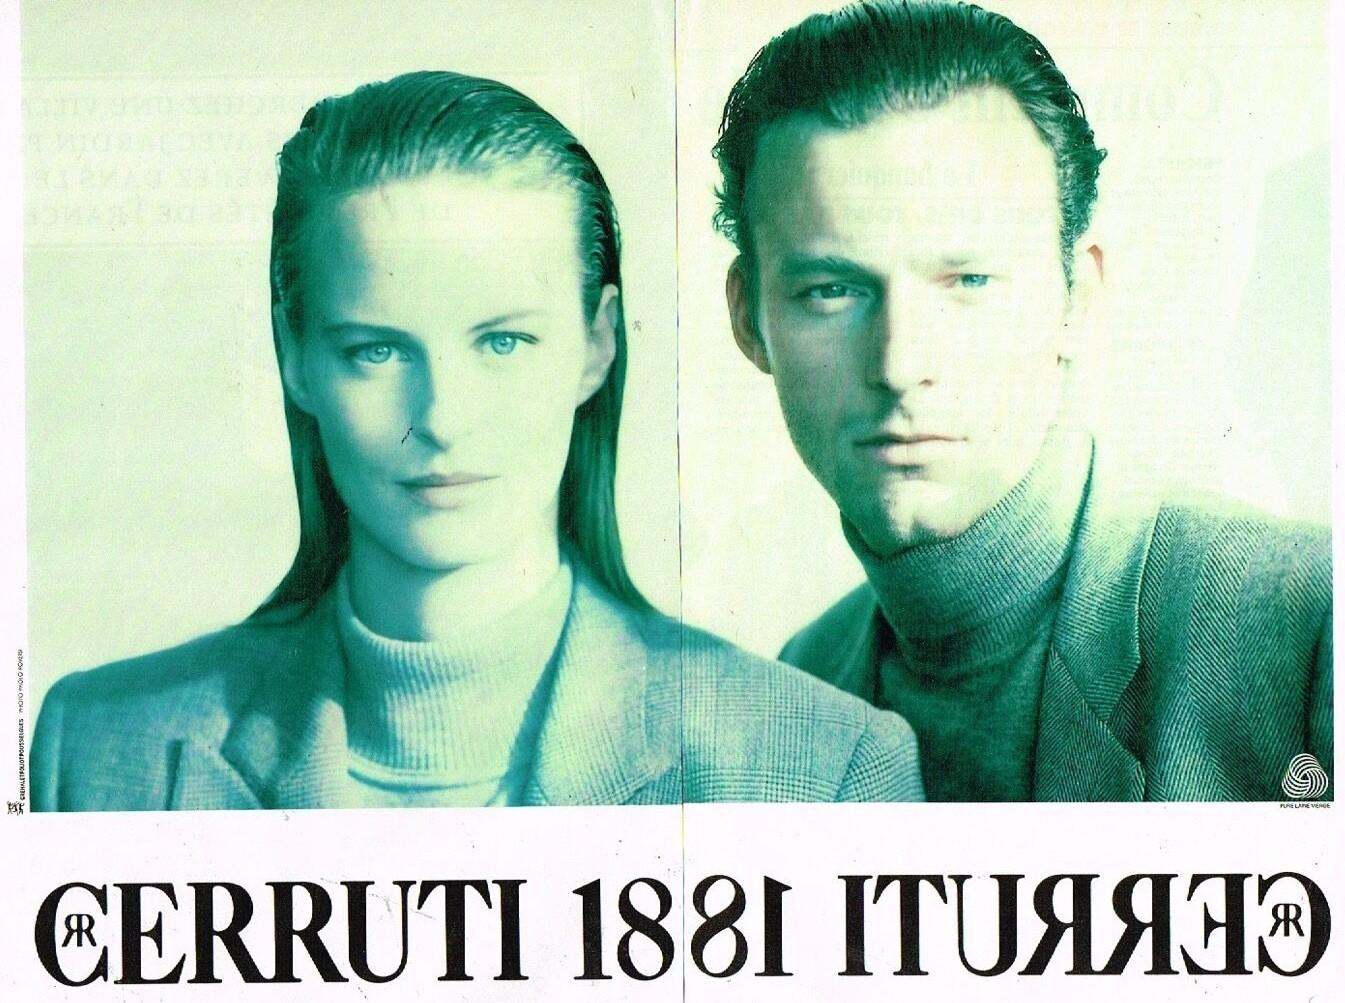 1989 Cerruti 1881 A1